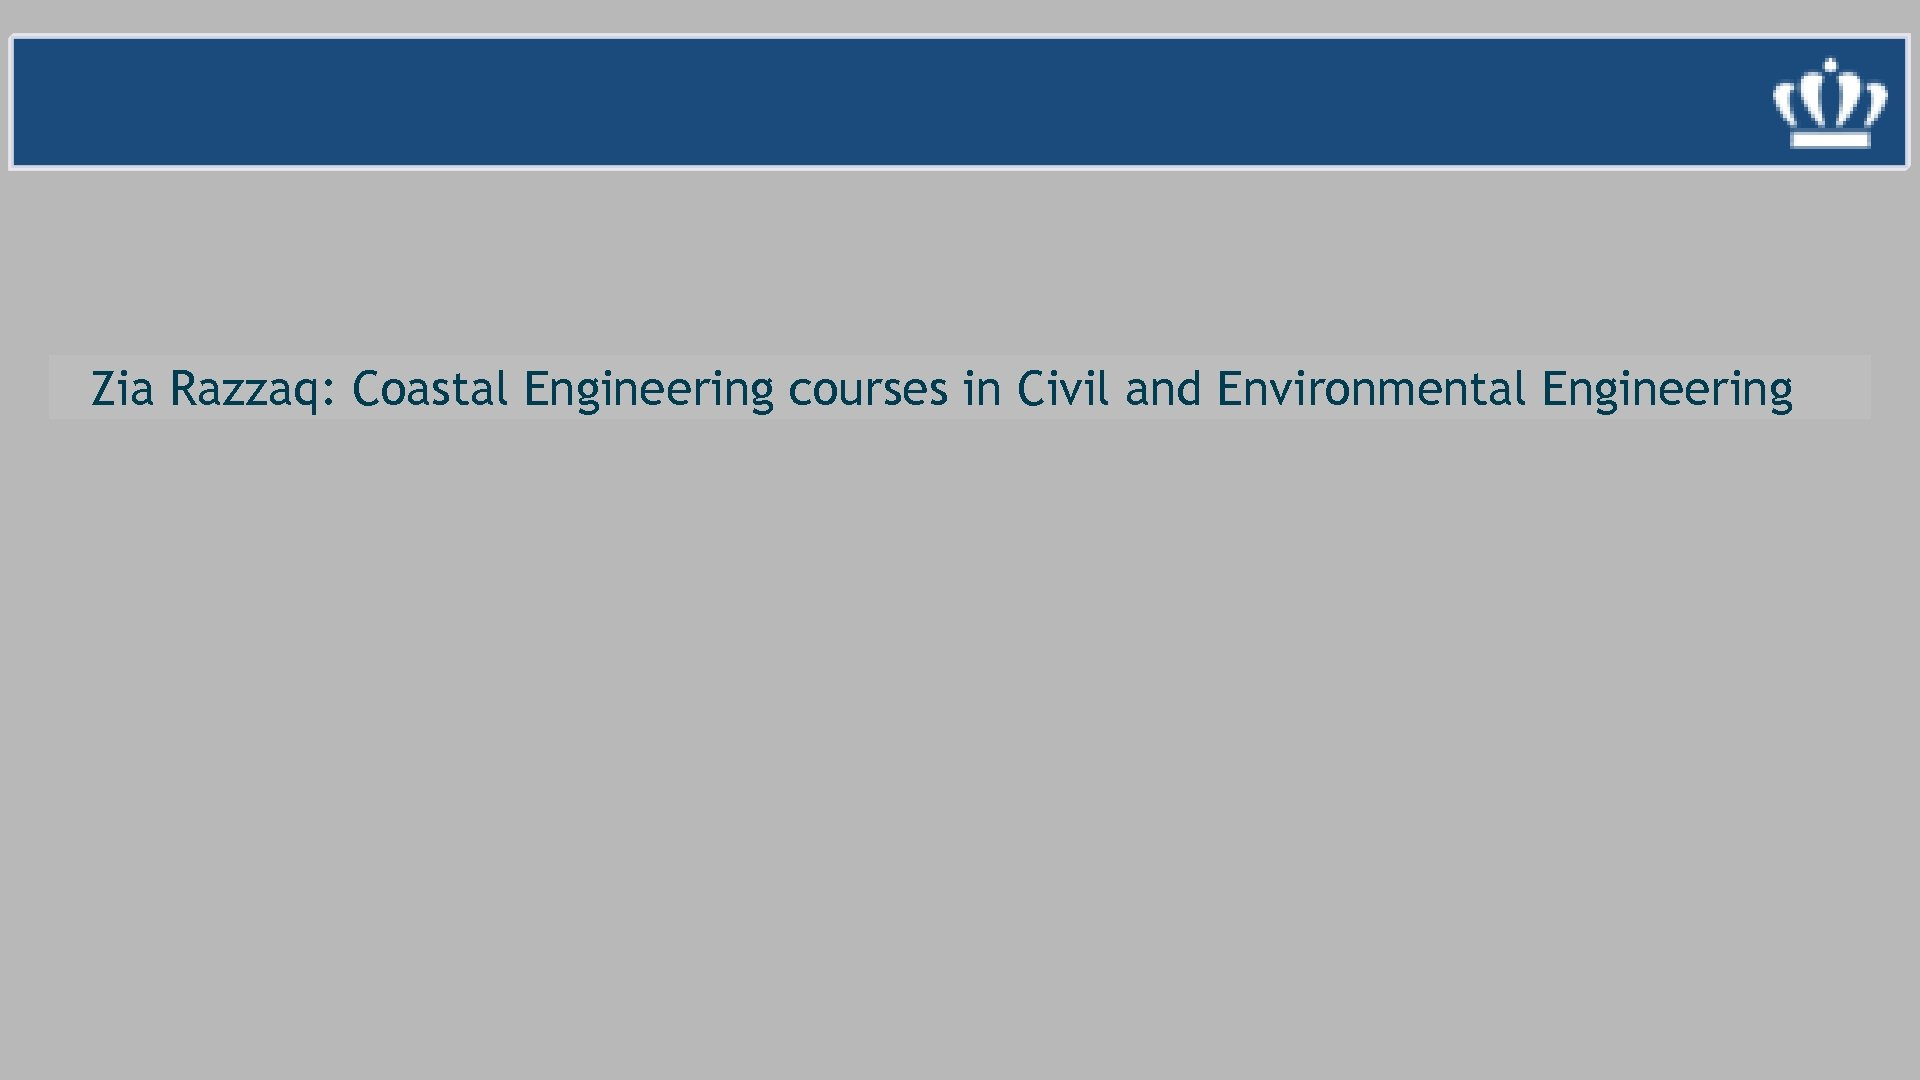 Zia Razzaq: Coastal Engineering courses in Civil and Environmental Engineering